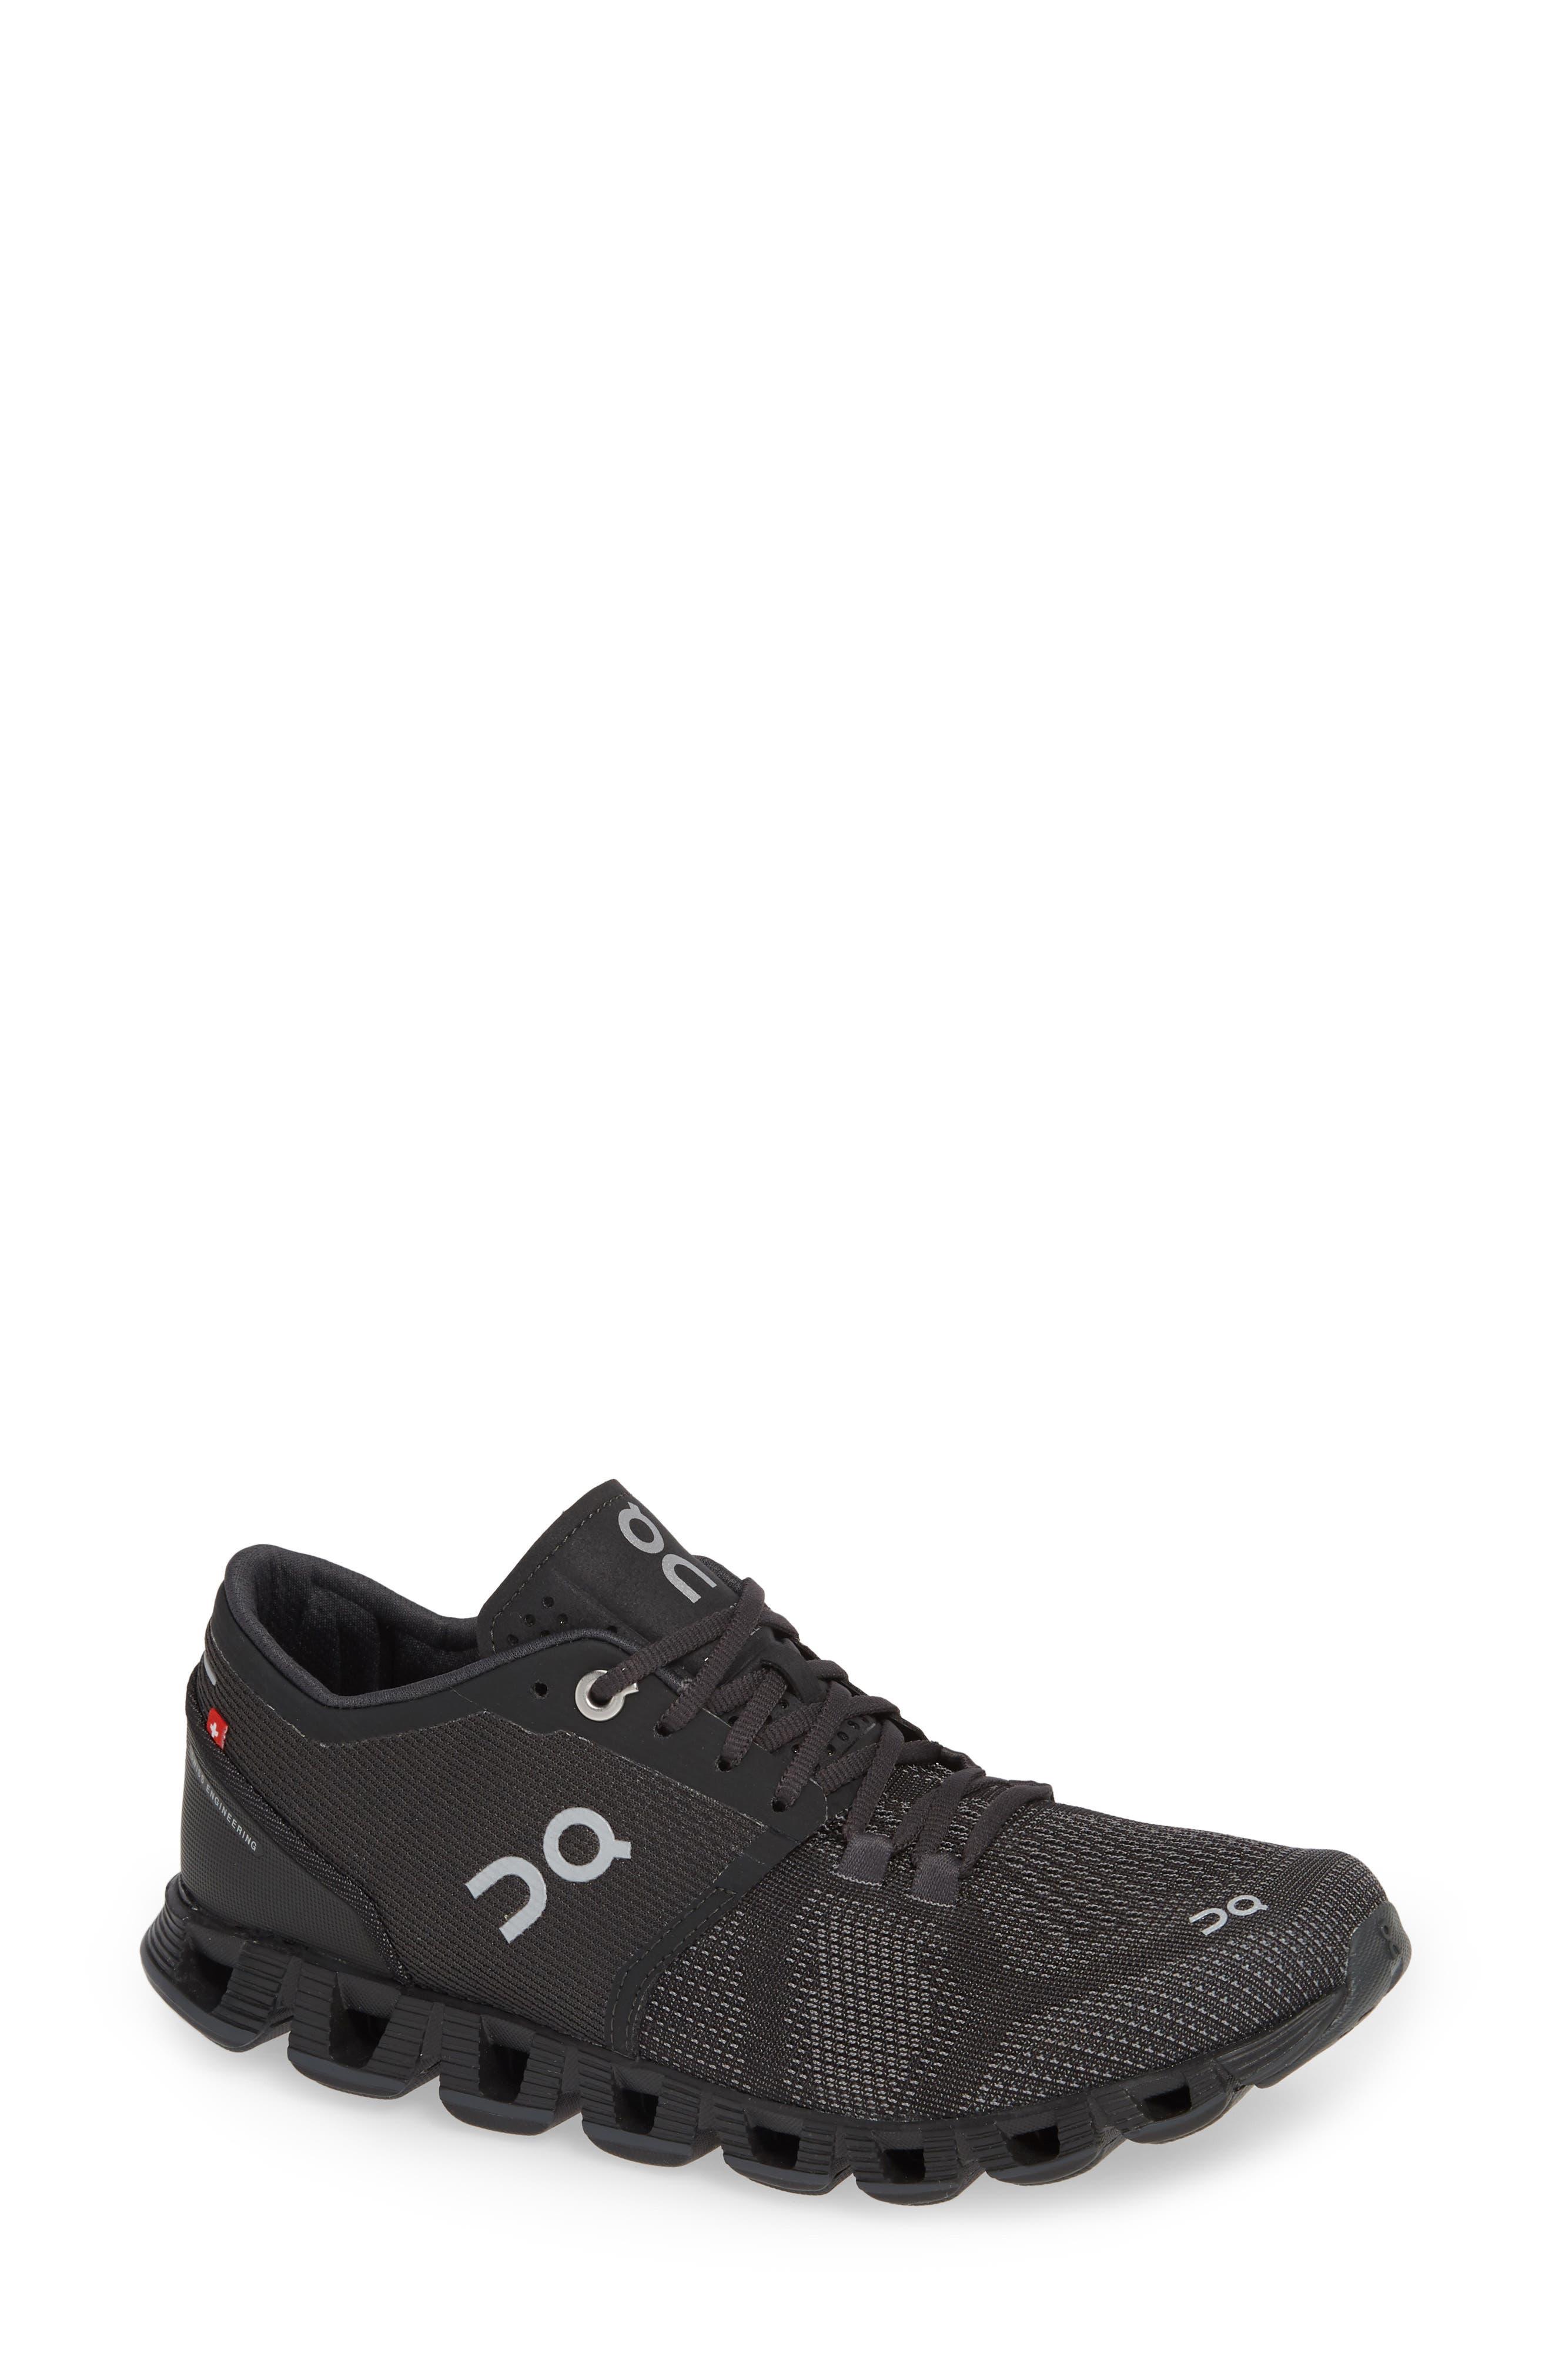 Cloud X Running Shoe,                             Main thumbnail 1, color,                             BLACK/ ASPHALT